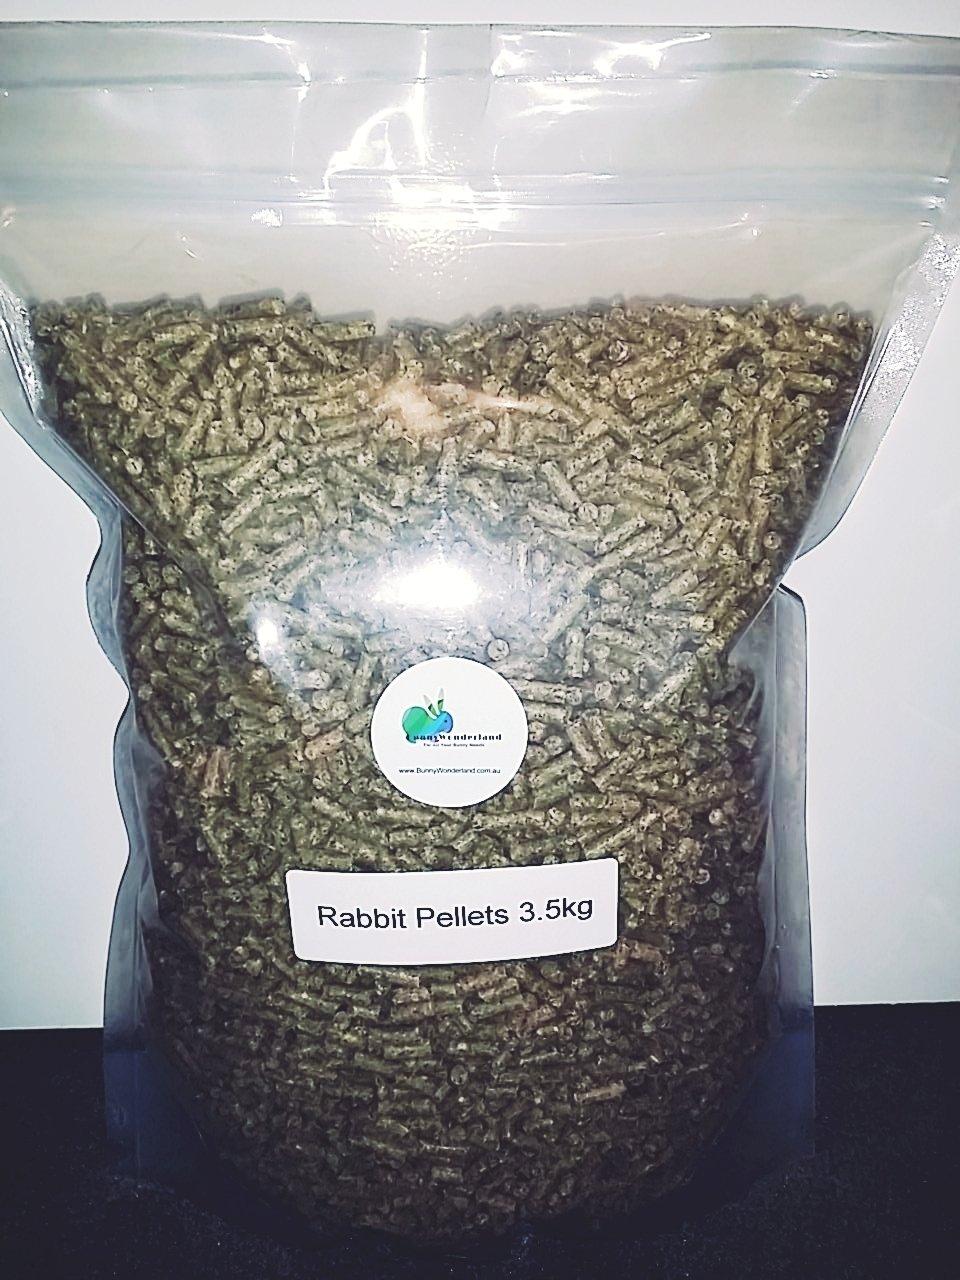 Barastoc Rabbit Pellets 3.5kg